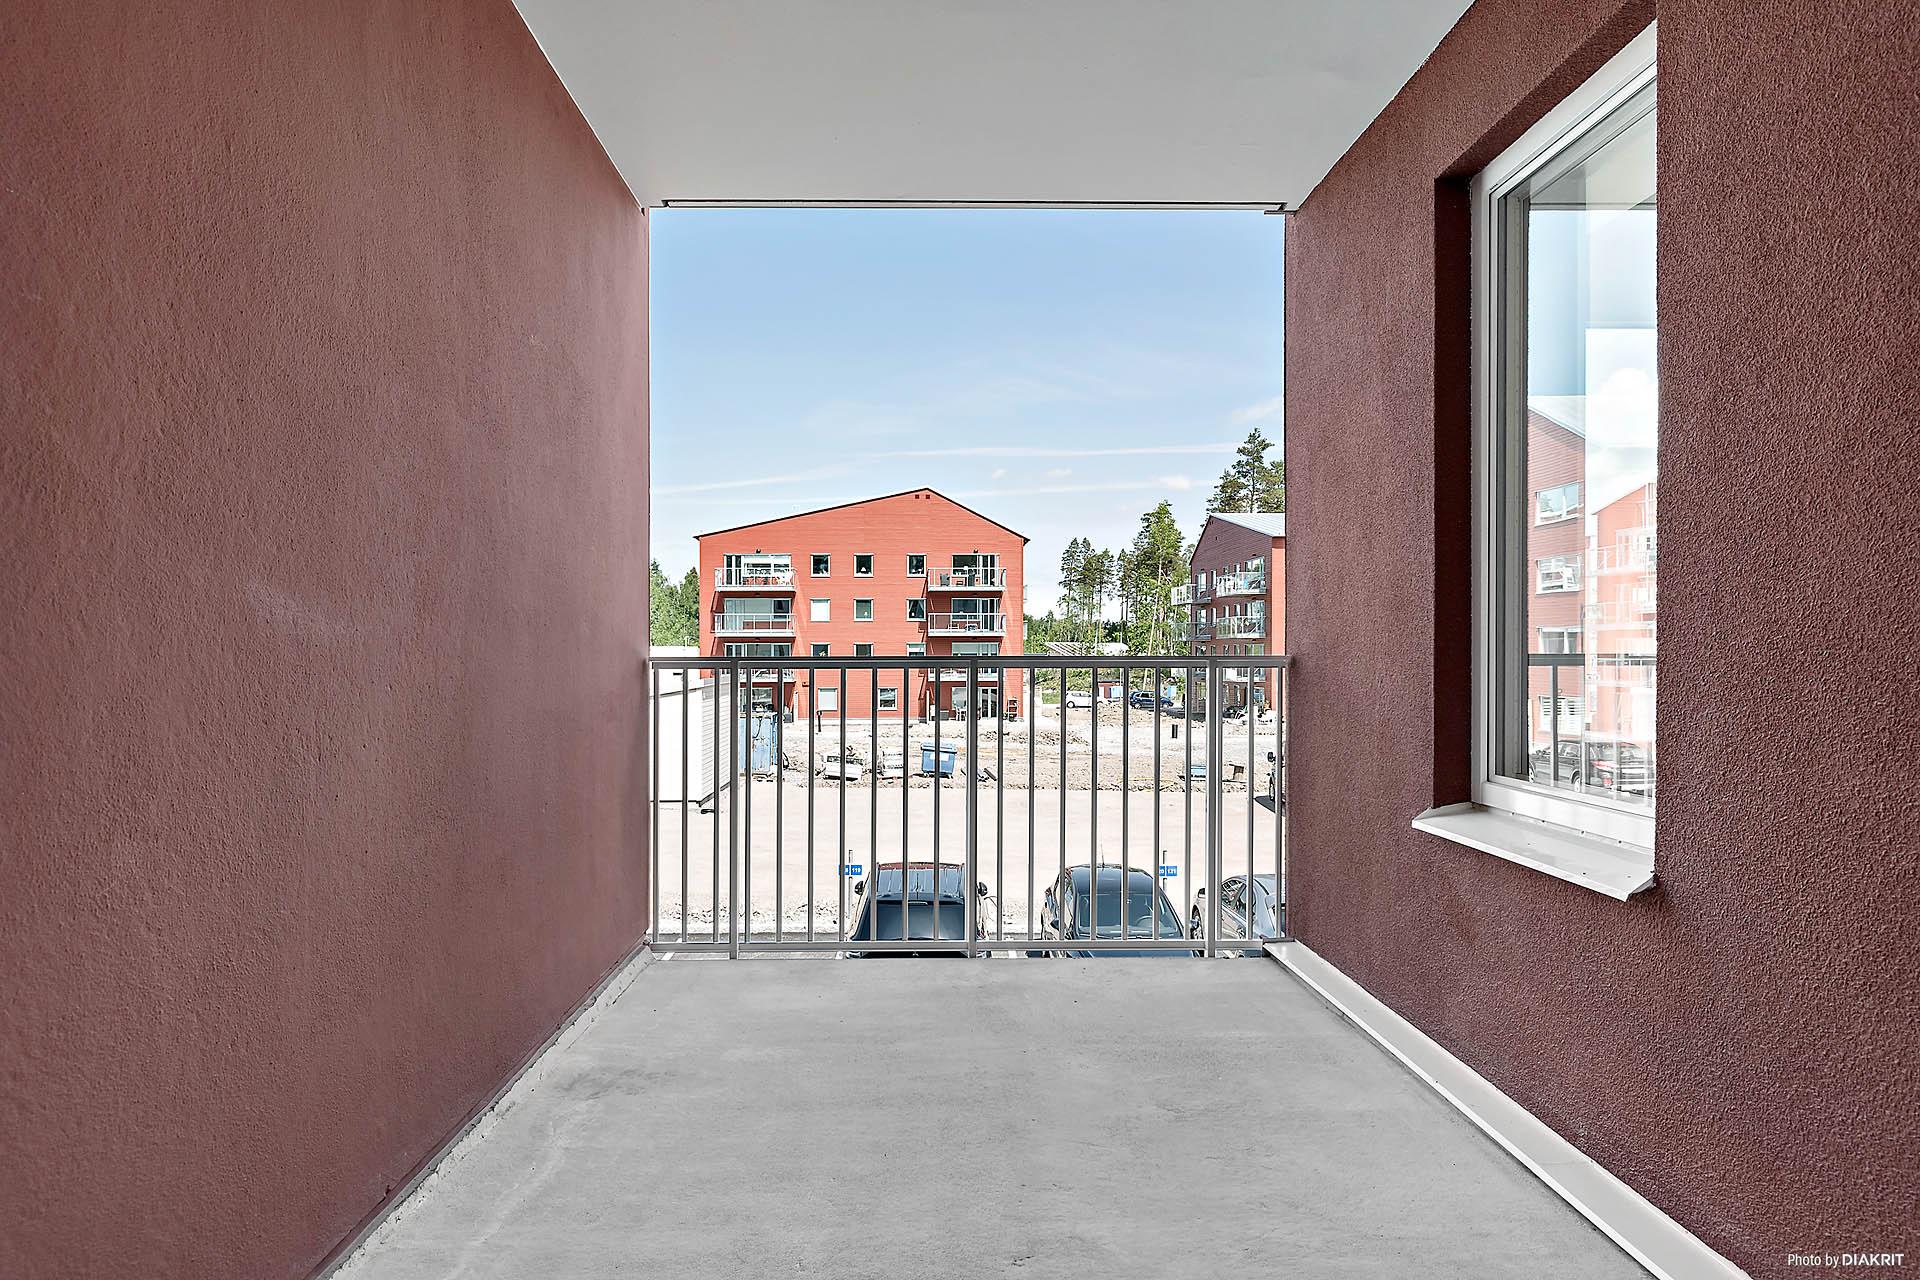 Inbyggd balkong i anslutning till entrén